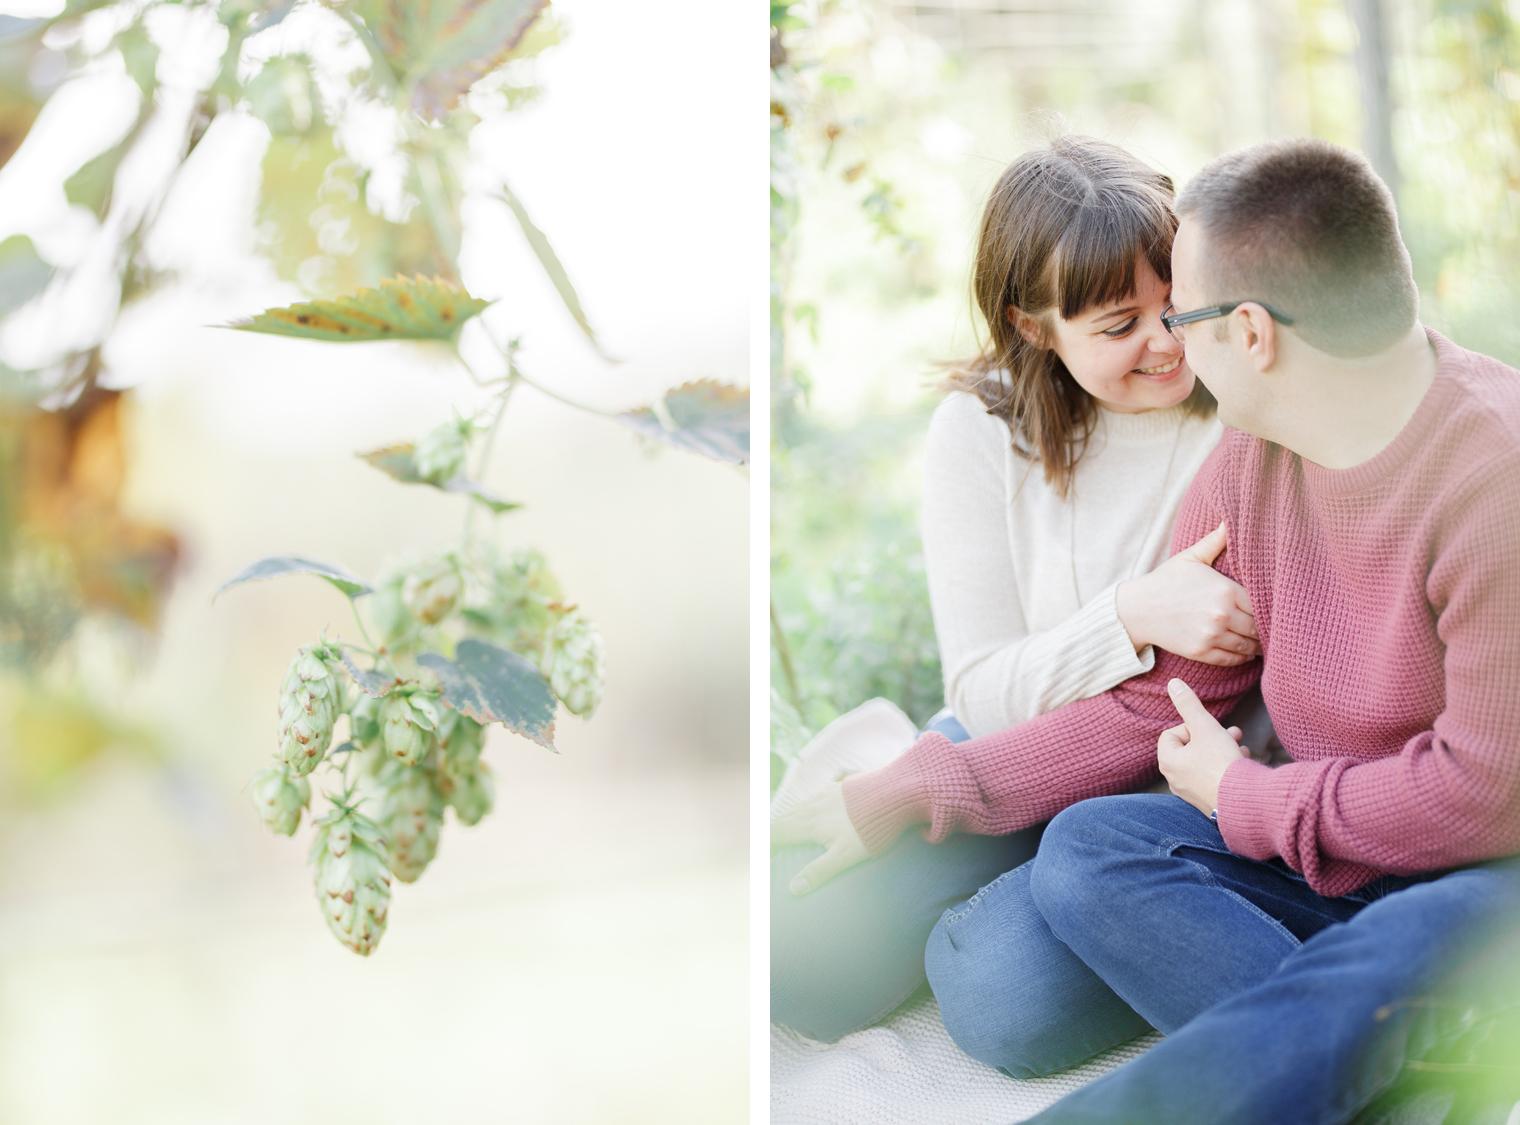 Bea & Bloom - Emma & Jamie Anniversary shoot by White Stag Weddings at Kent Life Farm